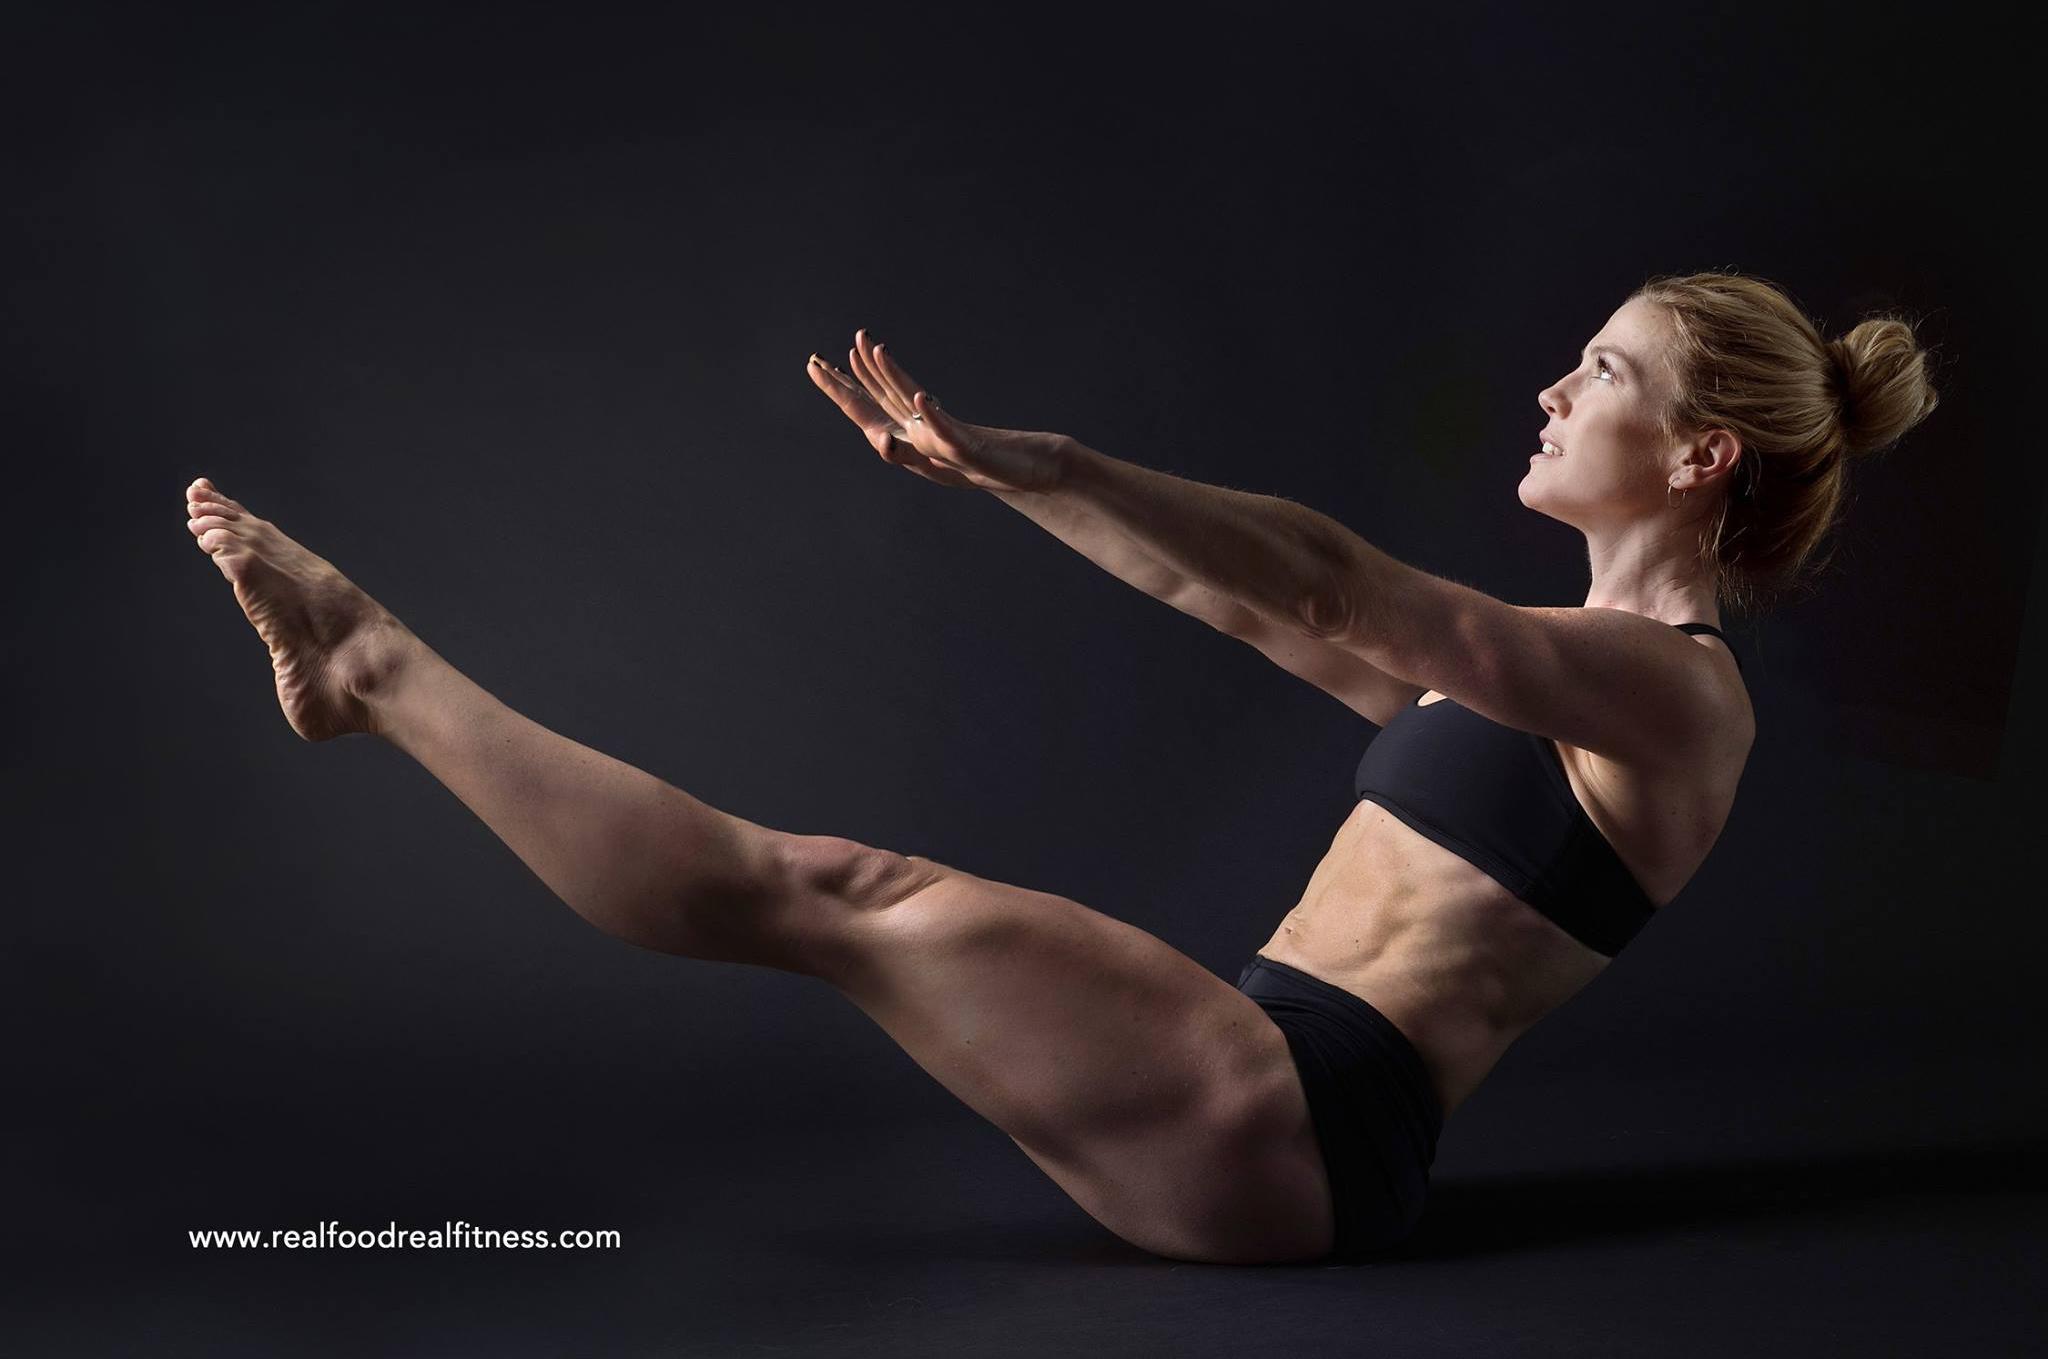 Certified Holistic Wellness Coach Susie Rahaim via Count Me Healthy Blog